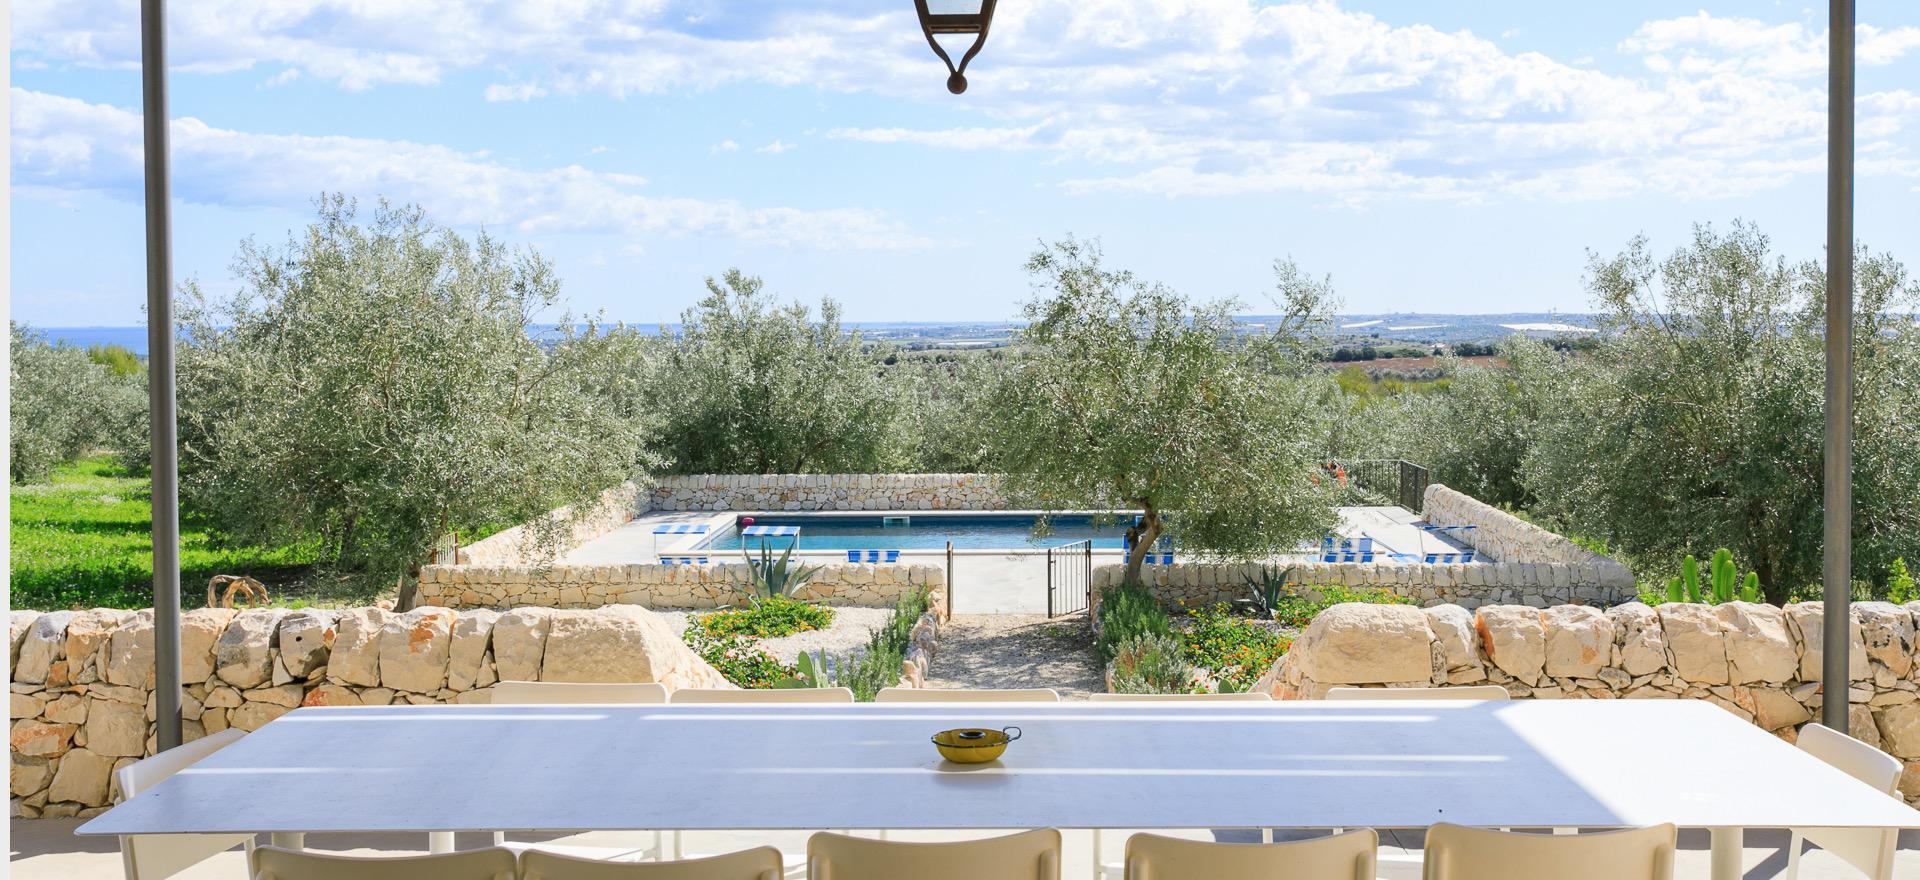 Agriturismo Sicilie Villa met zeezicht en privè zwembad in Sicilië